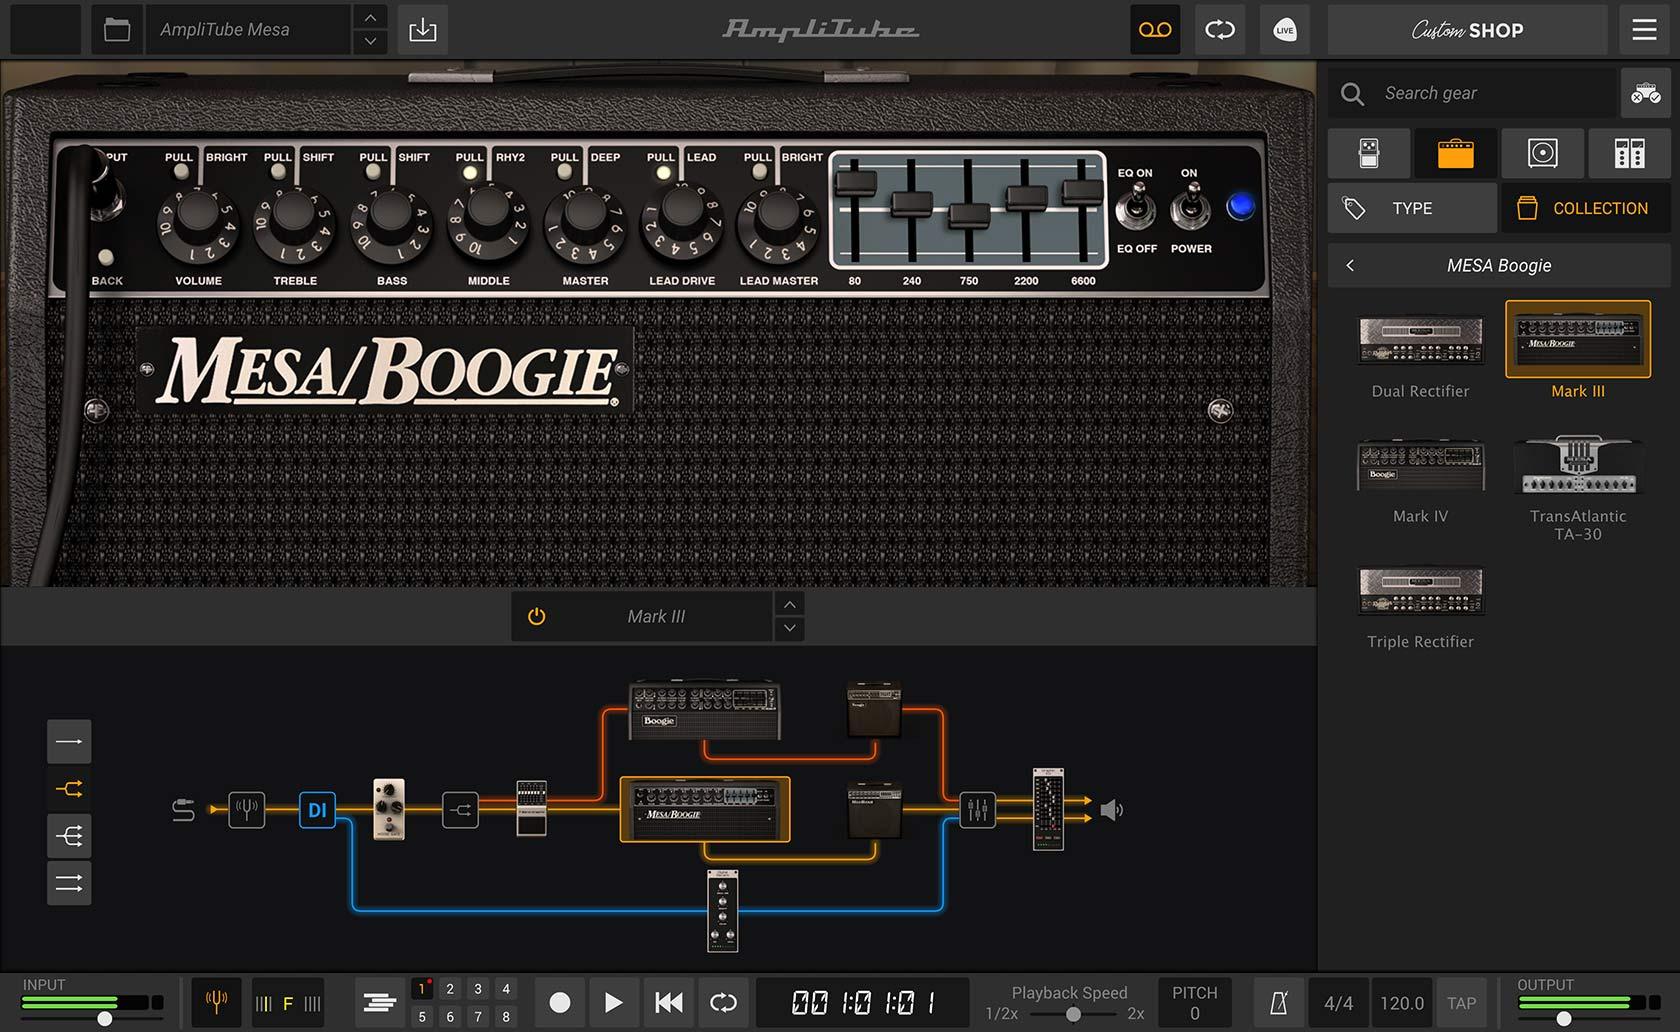 IK Multimedia - AmpliTube MESA/Boogie